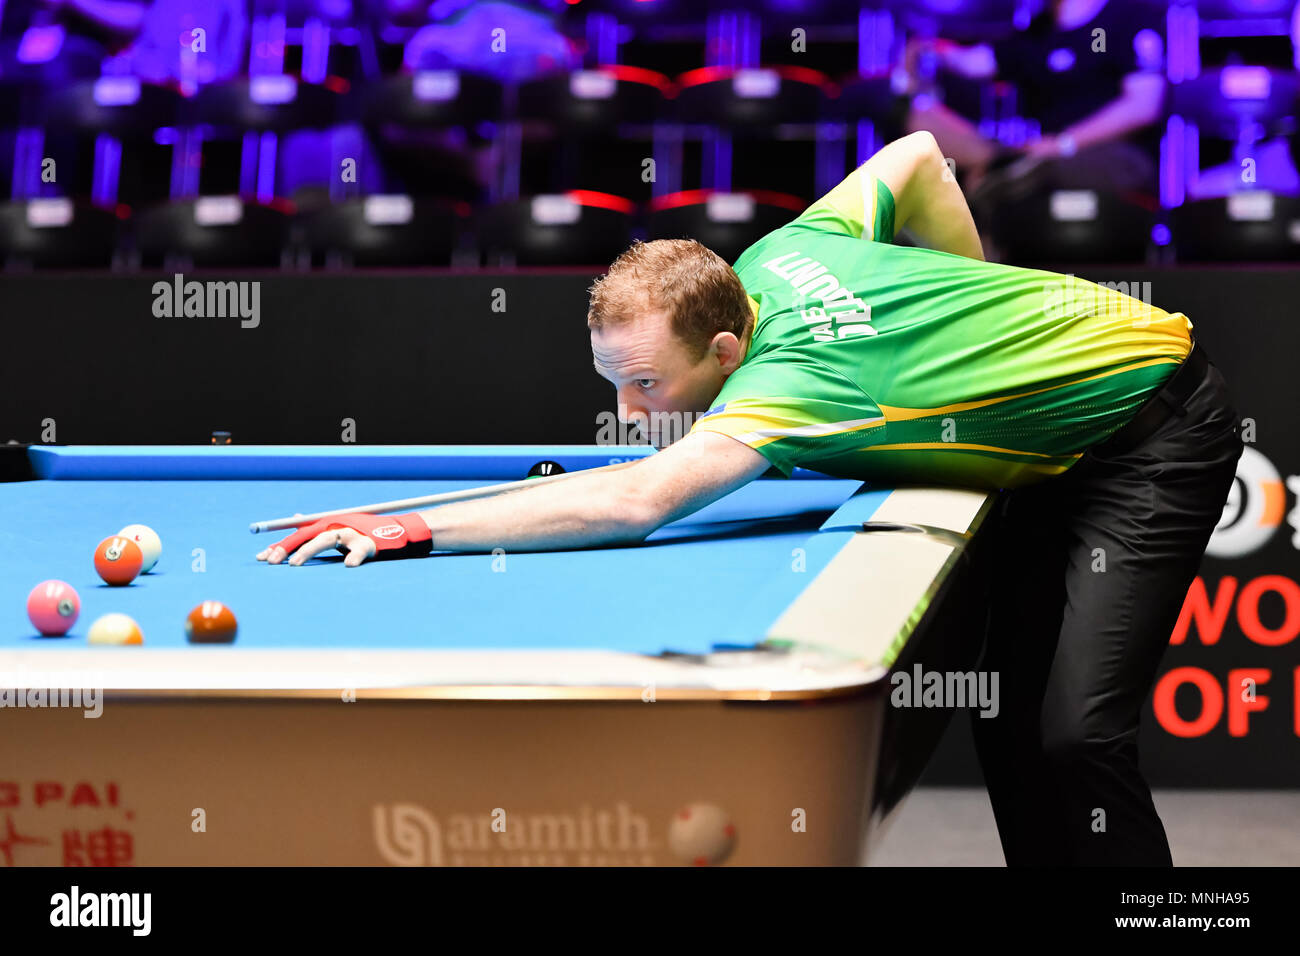 Australia's James Delahunty during WORLD CUP of POOL 2018: Round 1 - Australia vs Russia at Luwan (Gymnasium) Arena on Thursday, 17 May 2018. SHANGHAI, CHINA. Credit: Taka G Wu - Stock Image